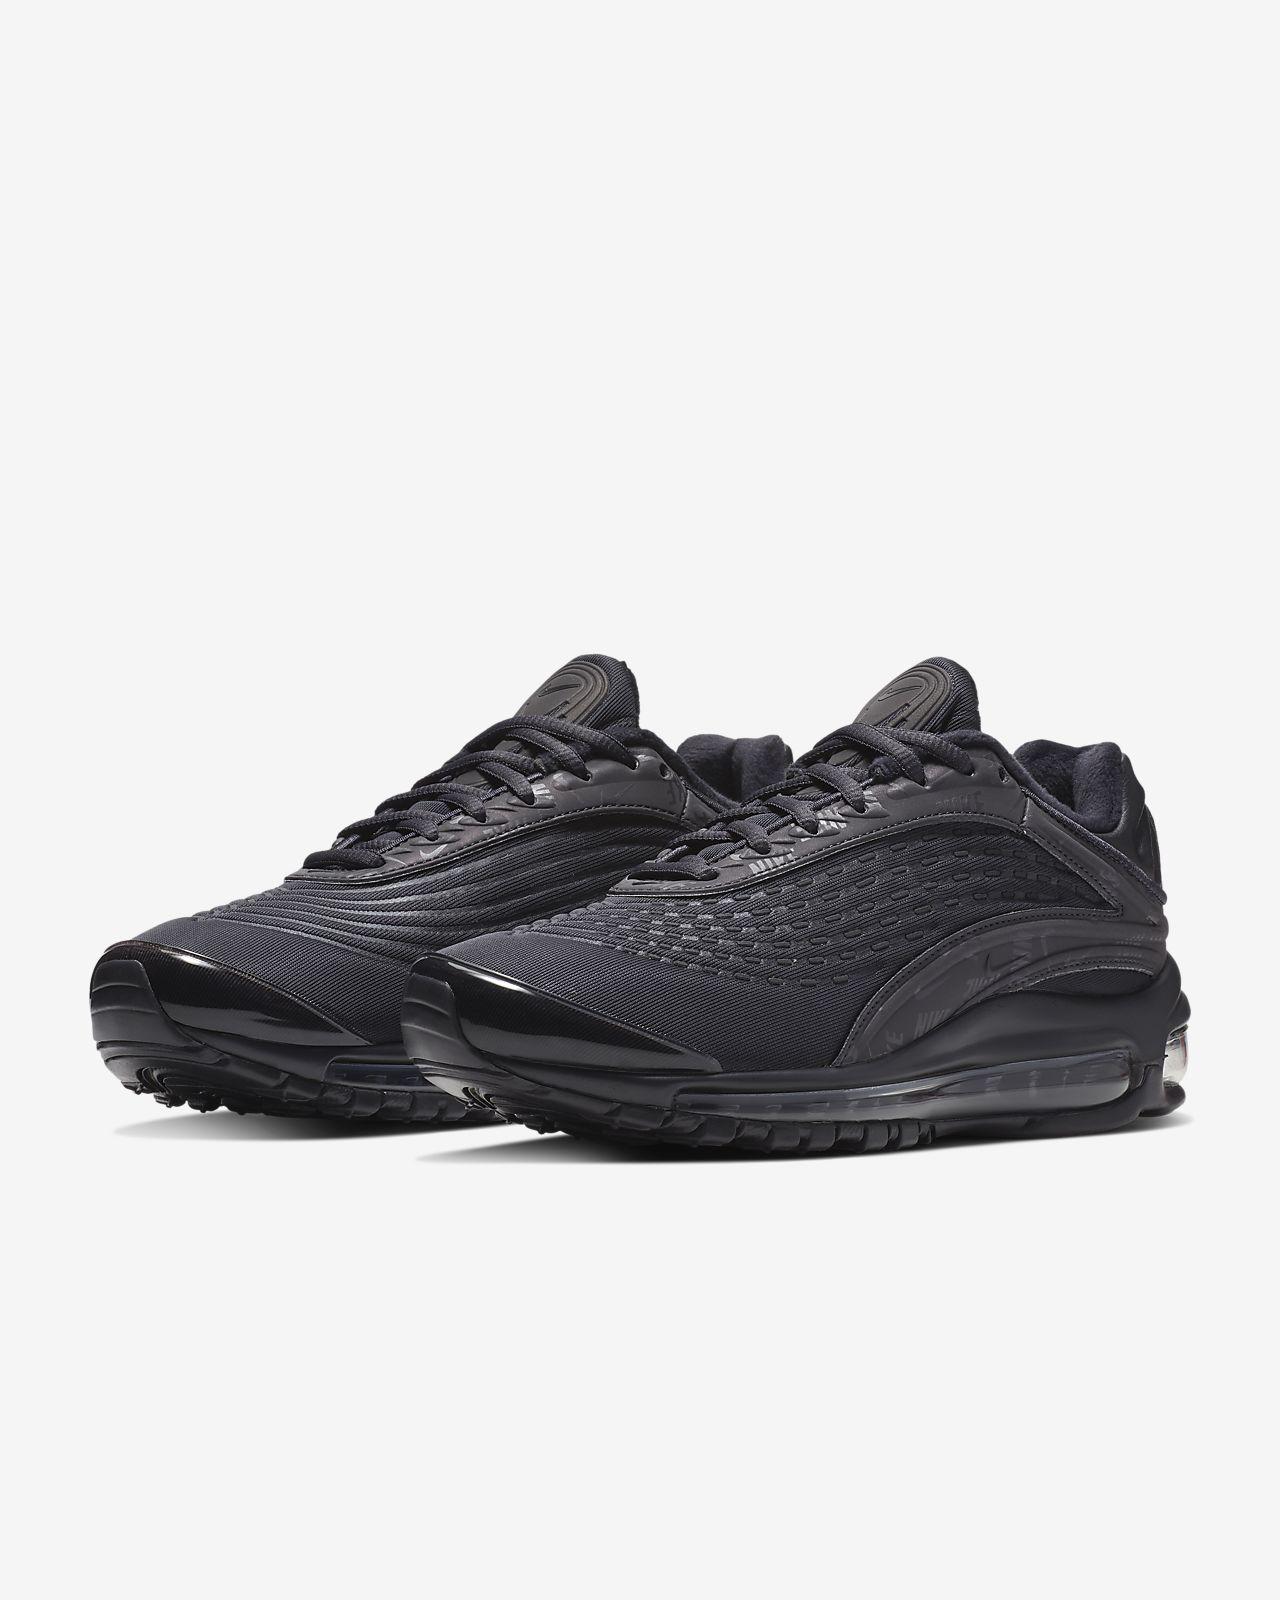 the best attitude 0d586 c2c63 ... Nike Air Max Deluxe SE Women s Shoe